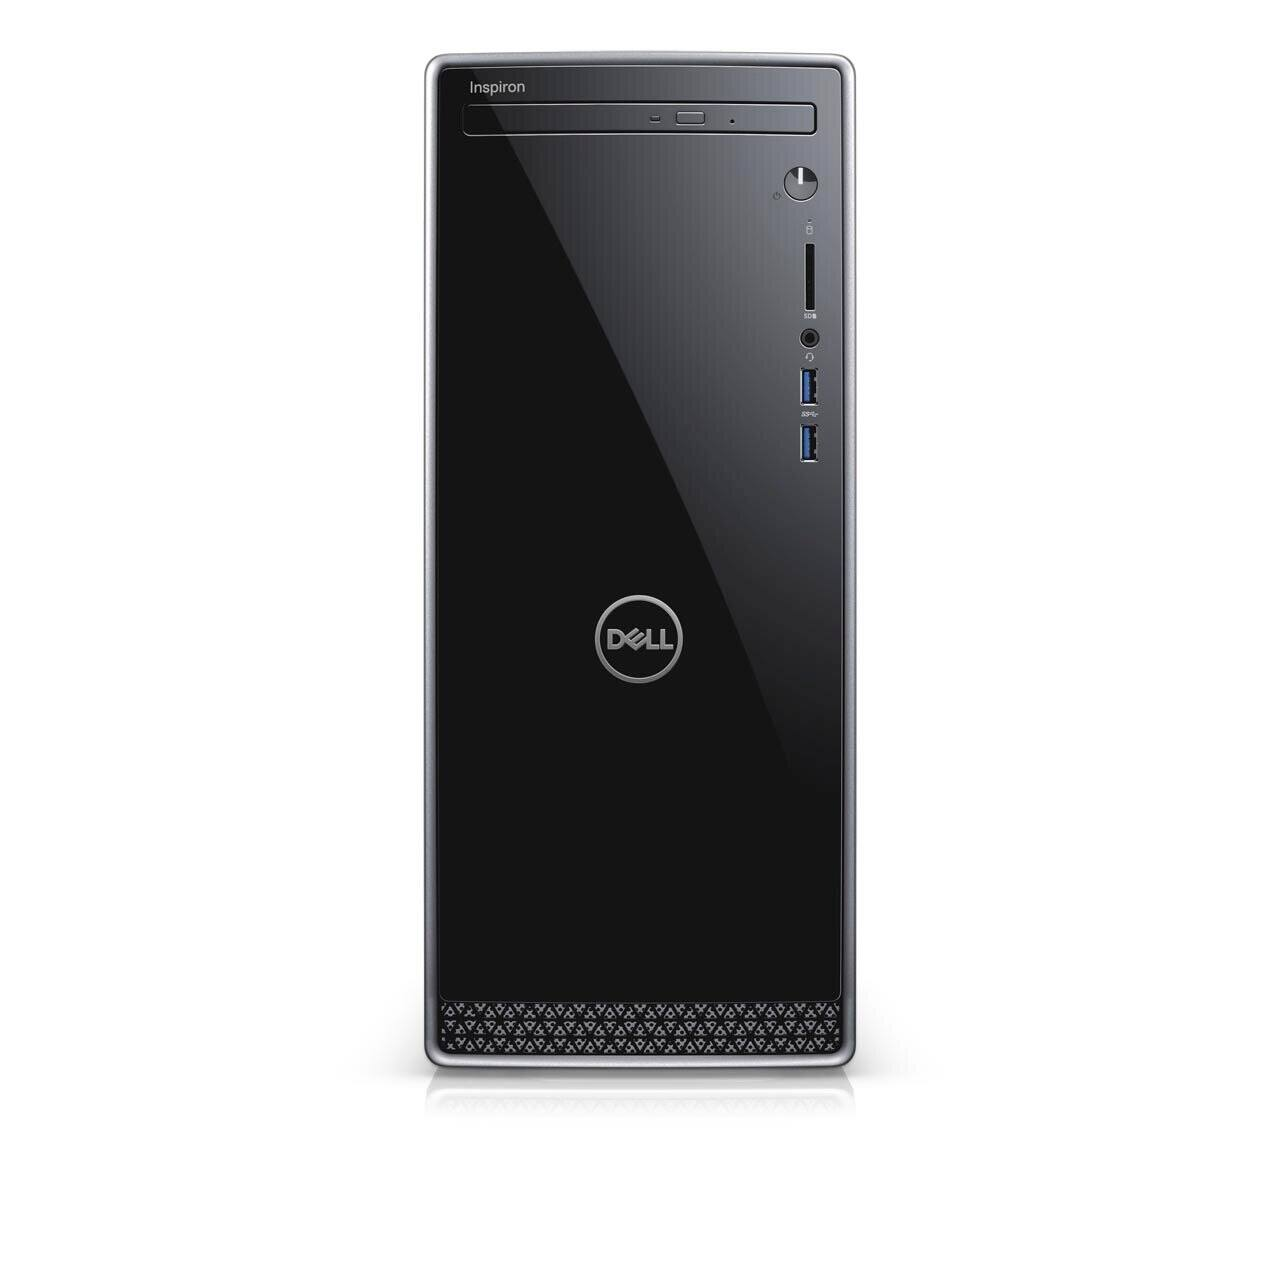 Dell Inspiron Desktop: i5-9400, 12GB RAM, 512GB NVMe SSD + FS $499.99